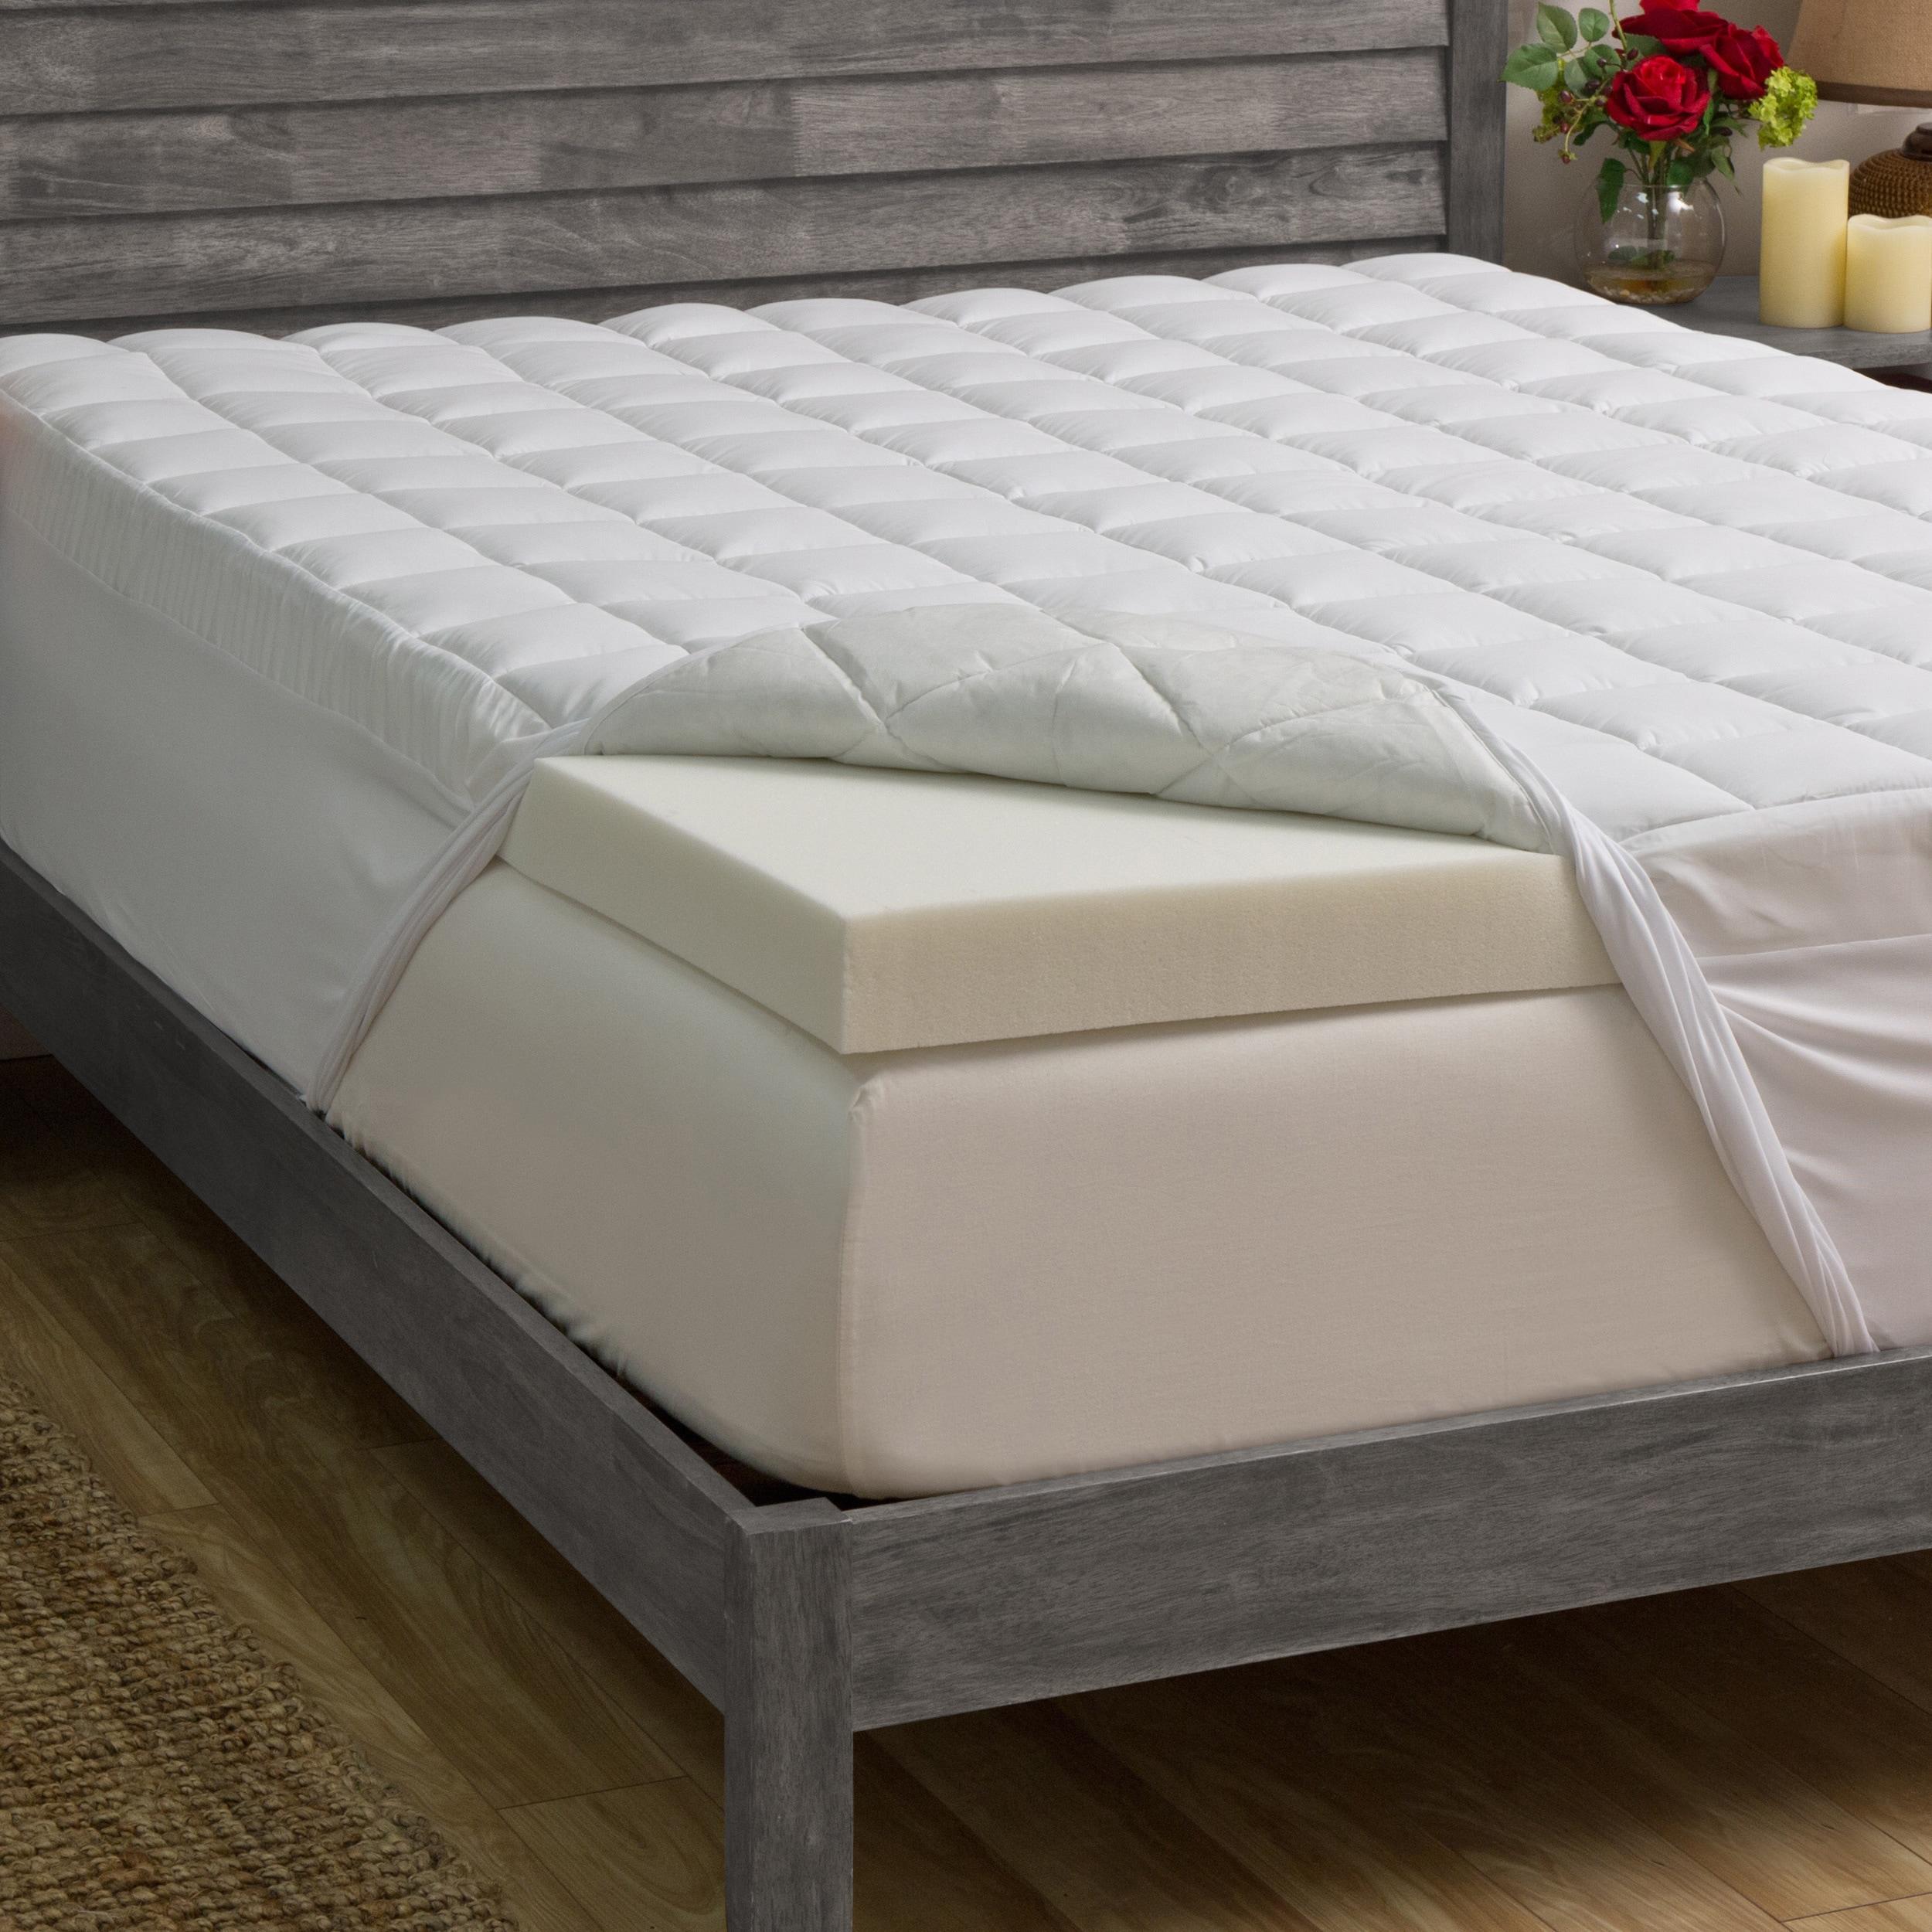 inch eco mattress pin sense gel foam and topper